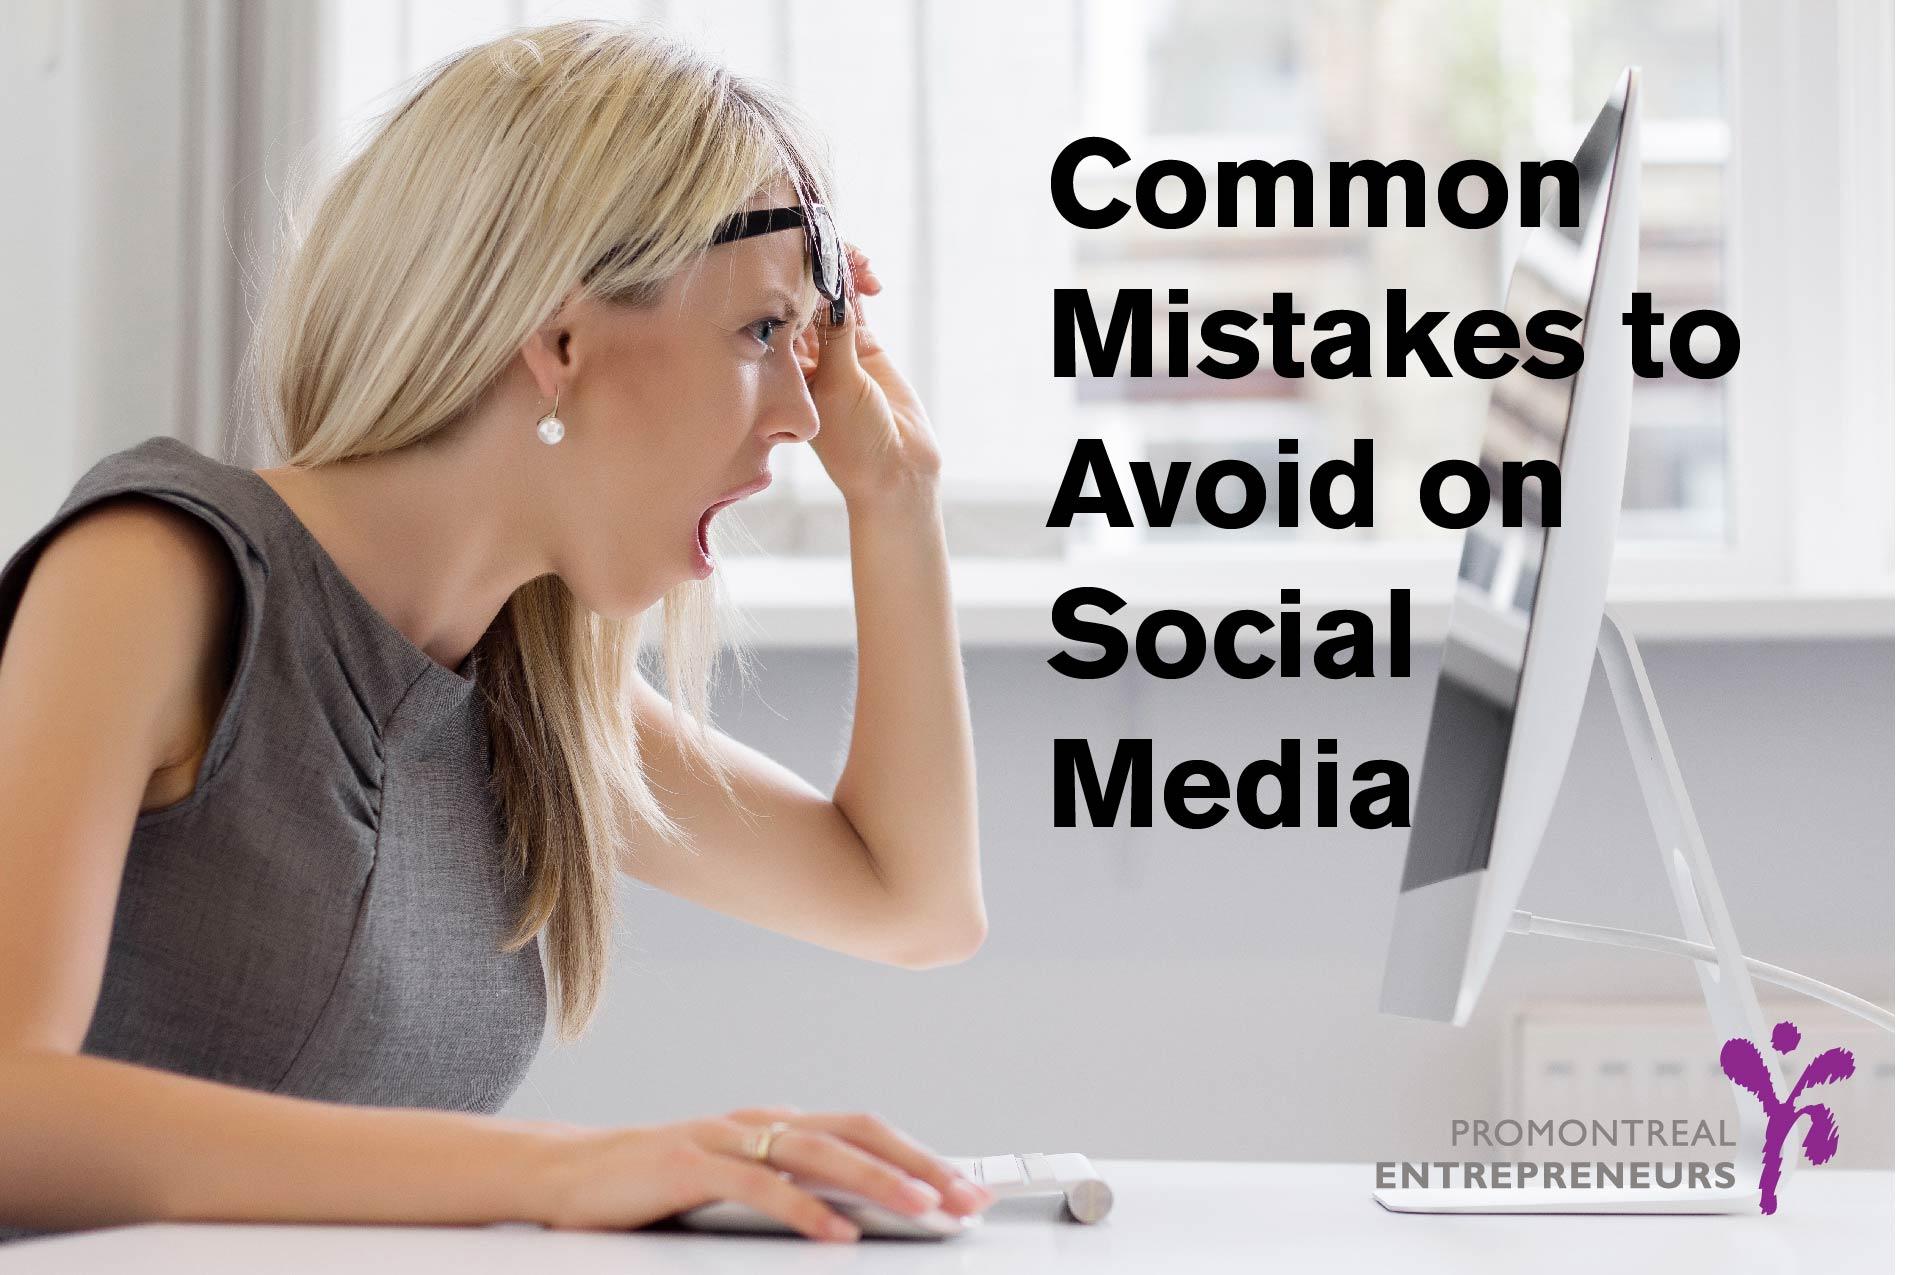 common-mistakes-to-avoid-on-social-media